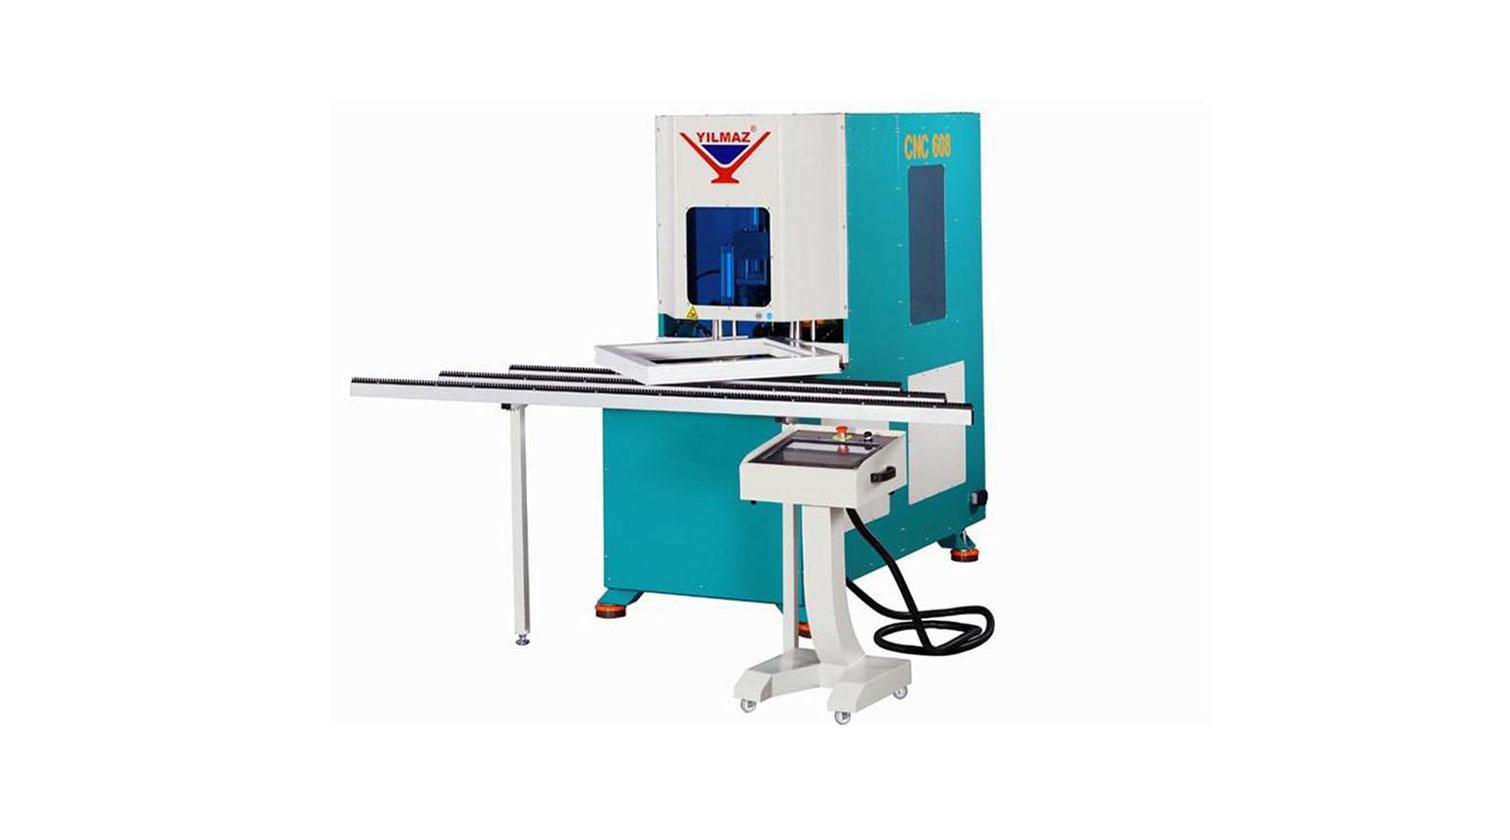 INT pvc corner cleaner Yilmaz CNC 610